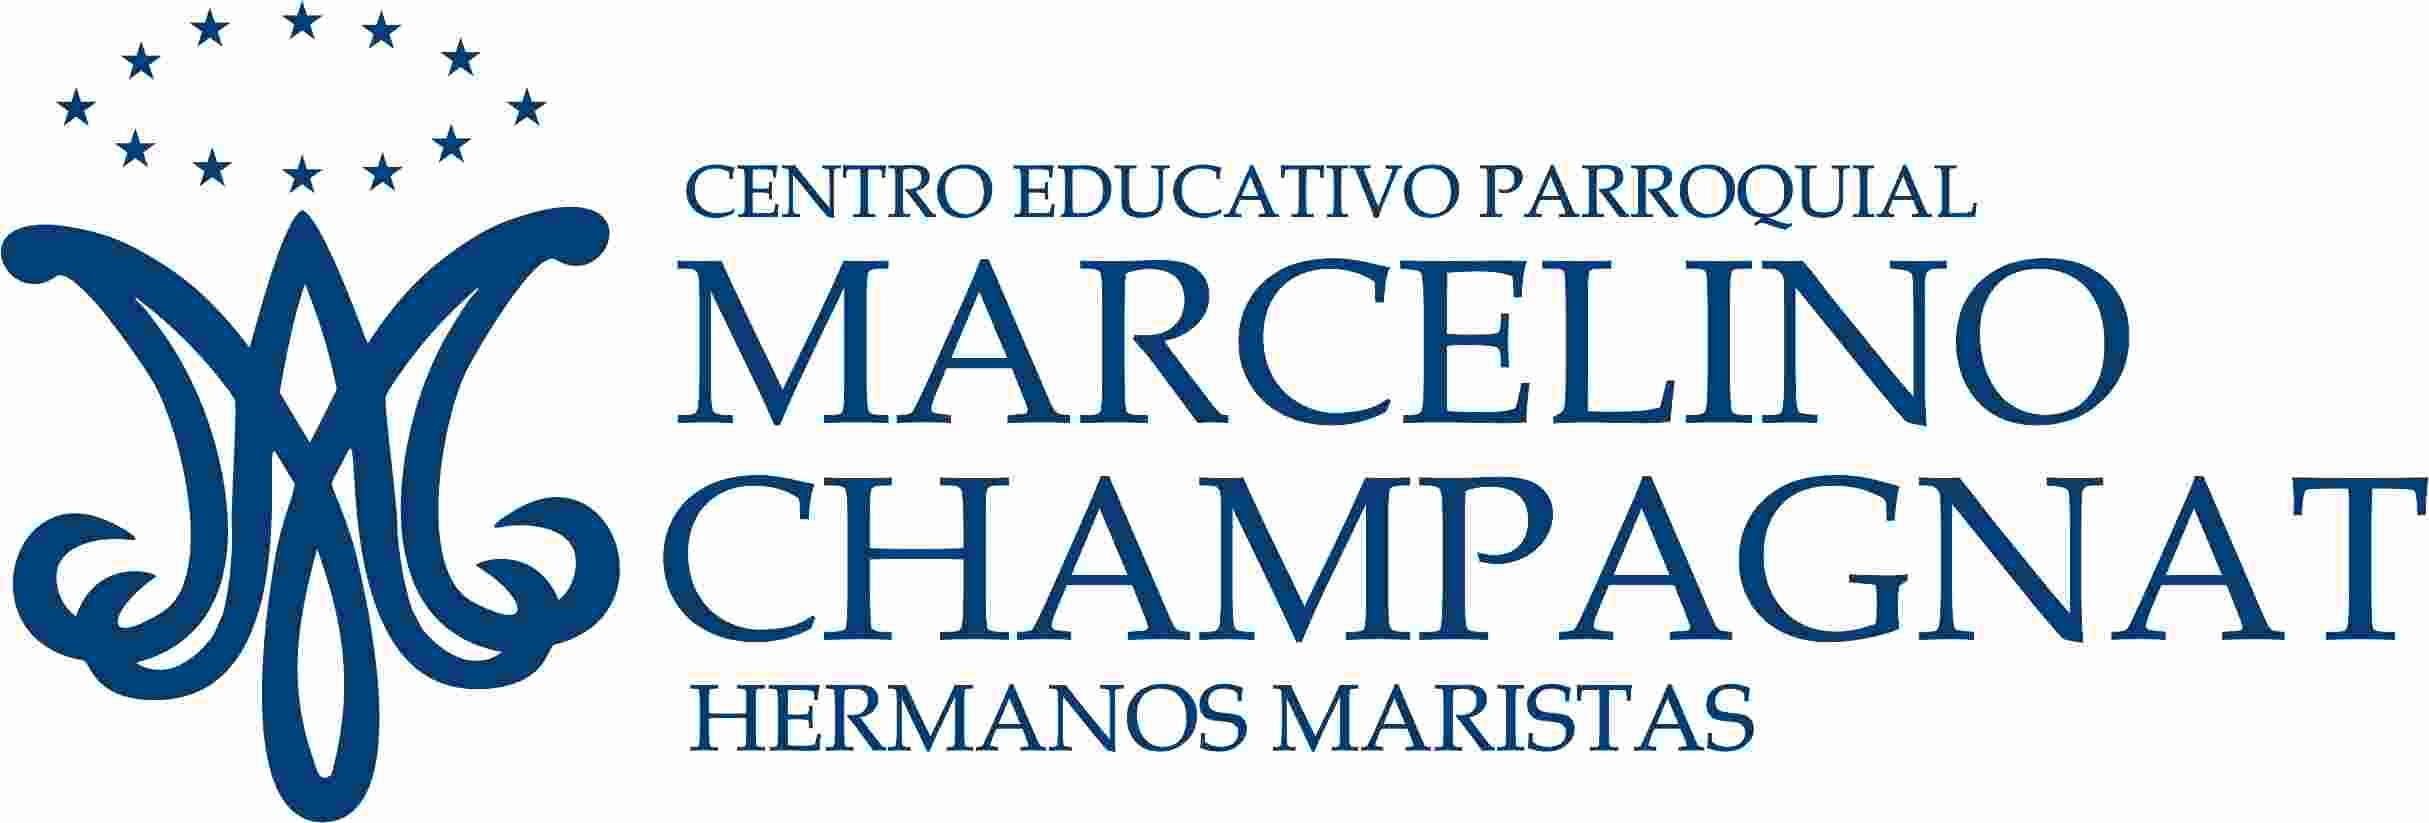 C.E. PARROQUIAL MARCELINO CHAMPAGNAT